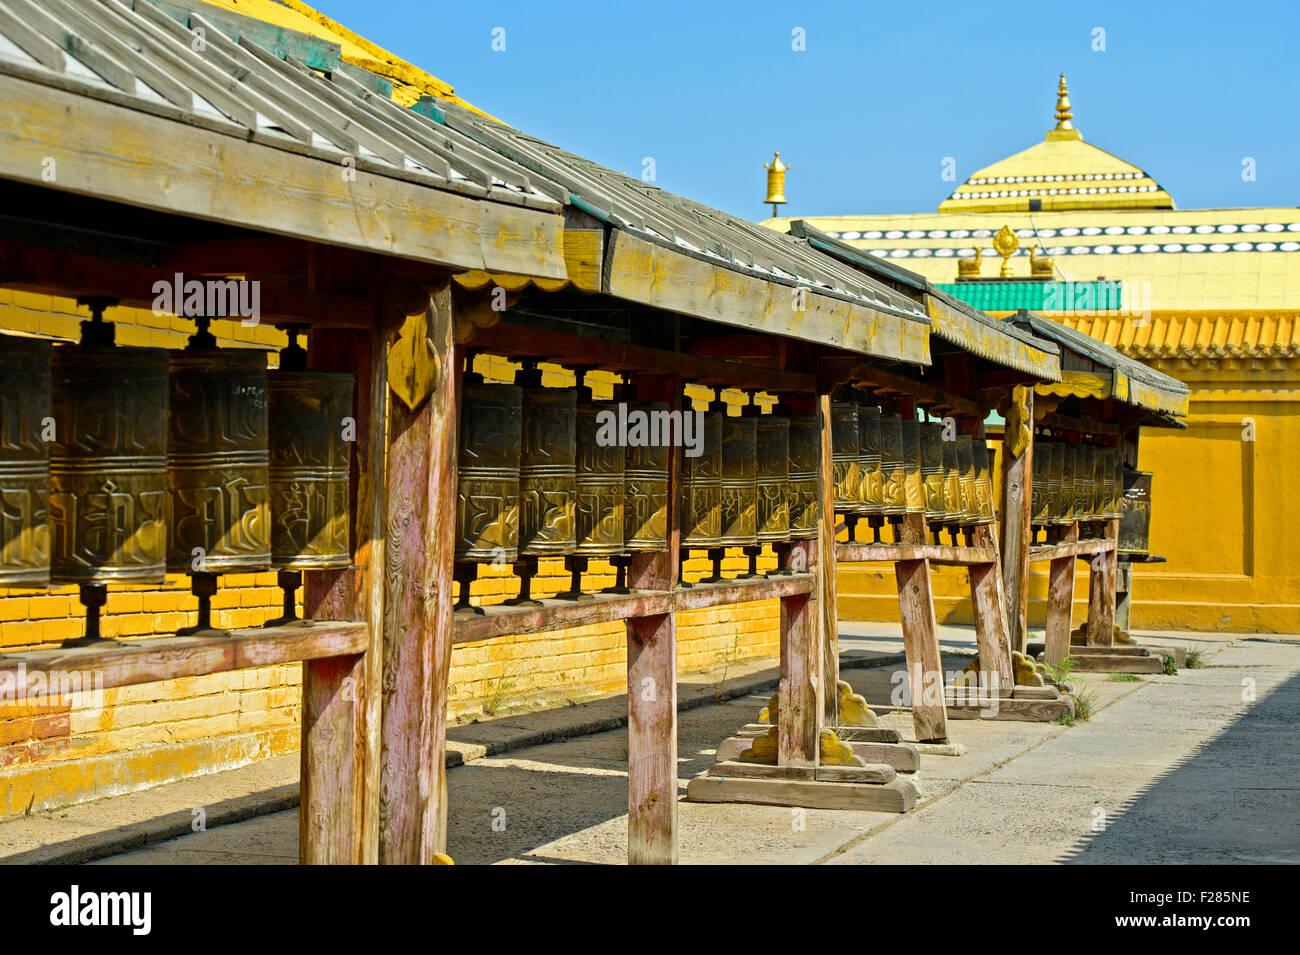 Prayer mills in the Buddhist Gandan Monastery, Ulaanbaatar, Mongolia - Stock Image